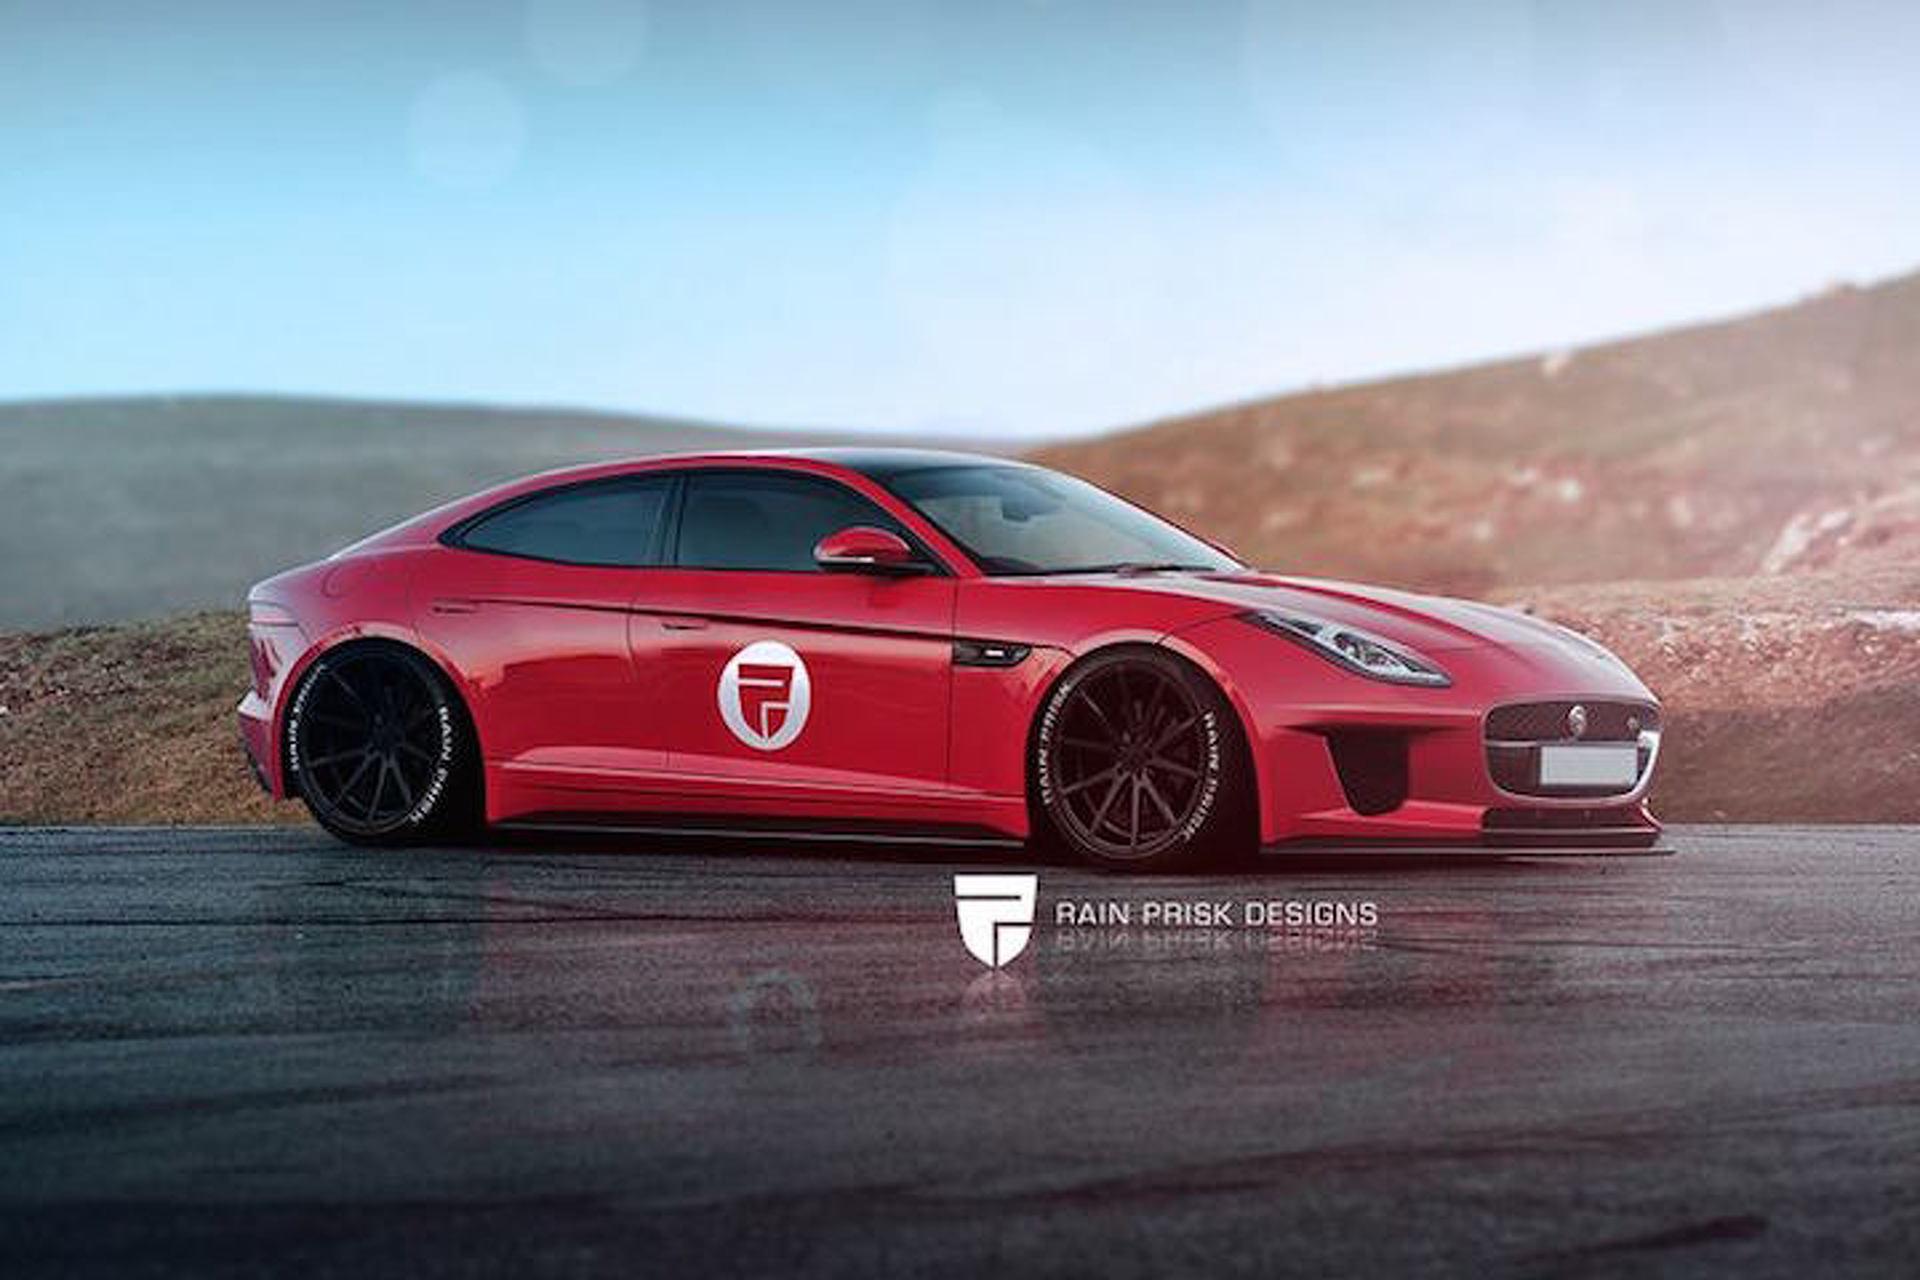 Jaguar F-Type Sedan and Shooting Brake Concepts Look Glorious